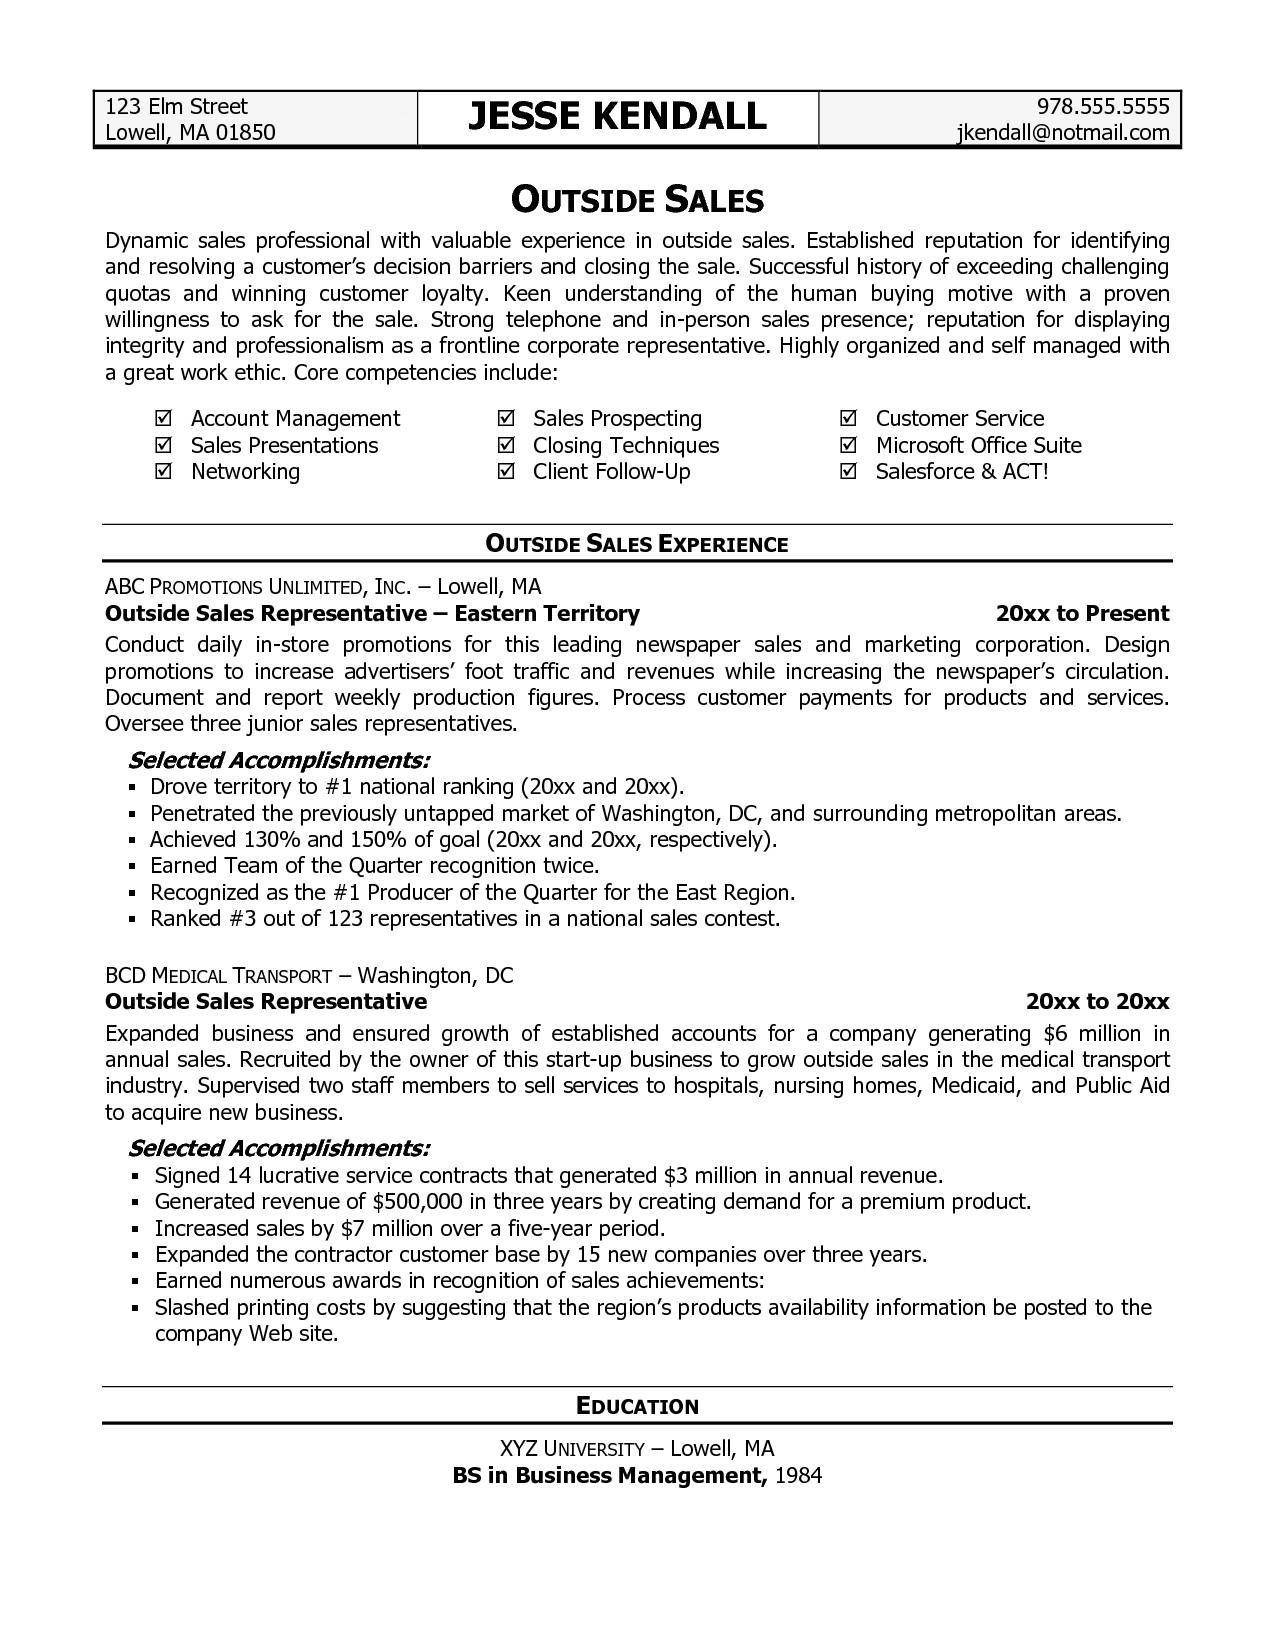 wine sales resume